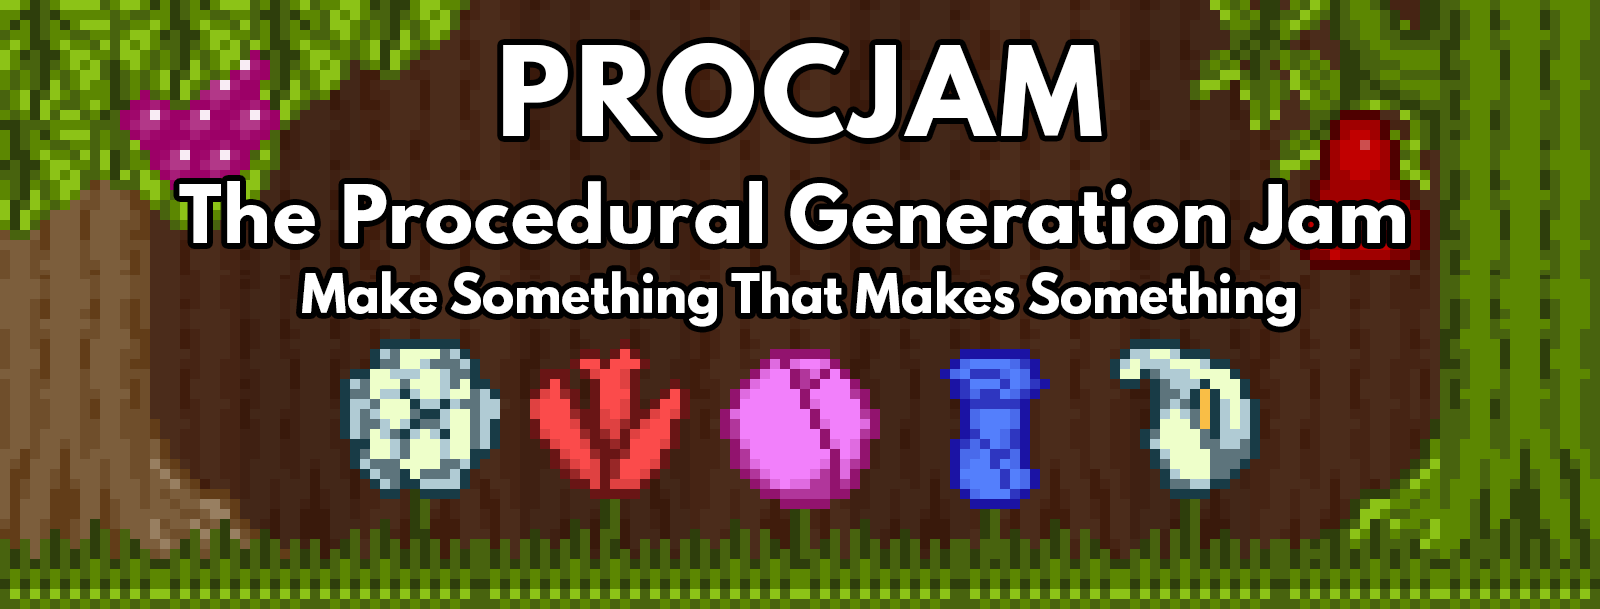 Procedural Generation Jam 2016